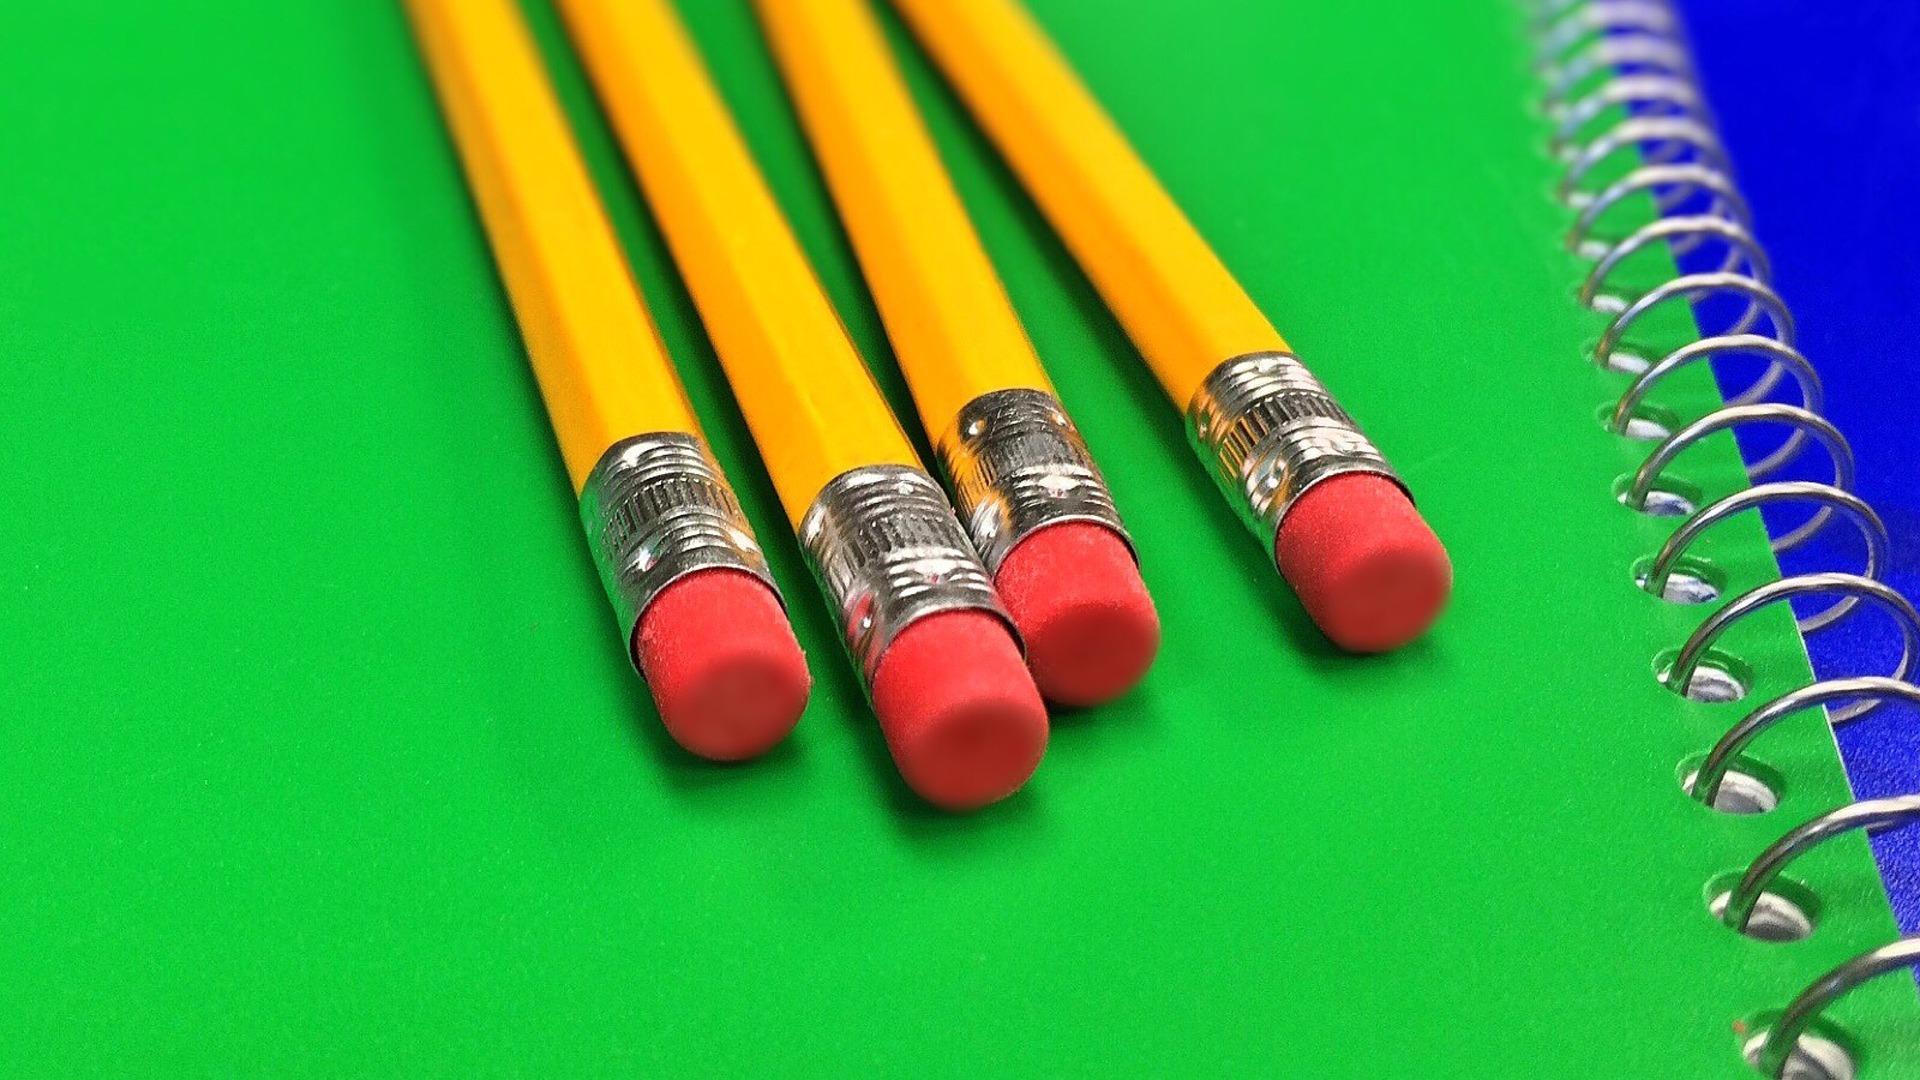 pencil-878696_1920.jpg